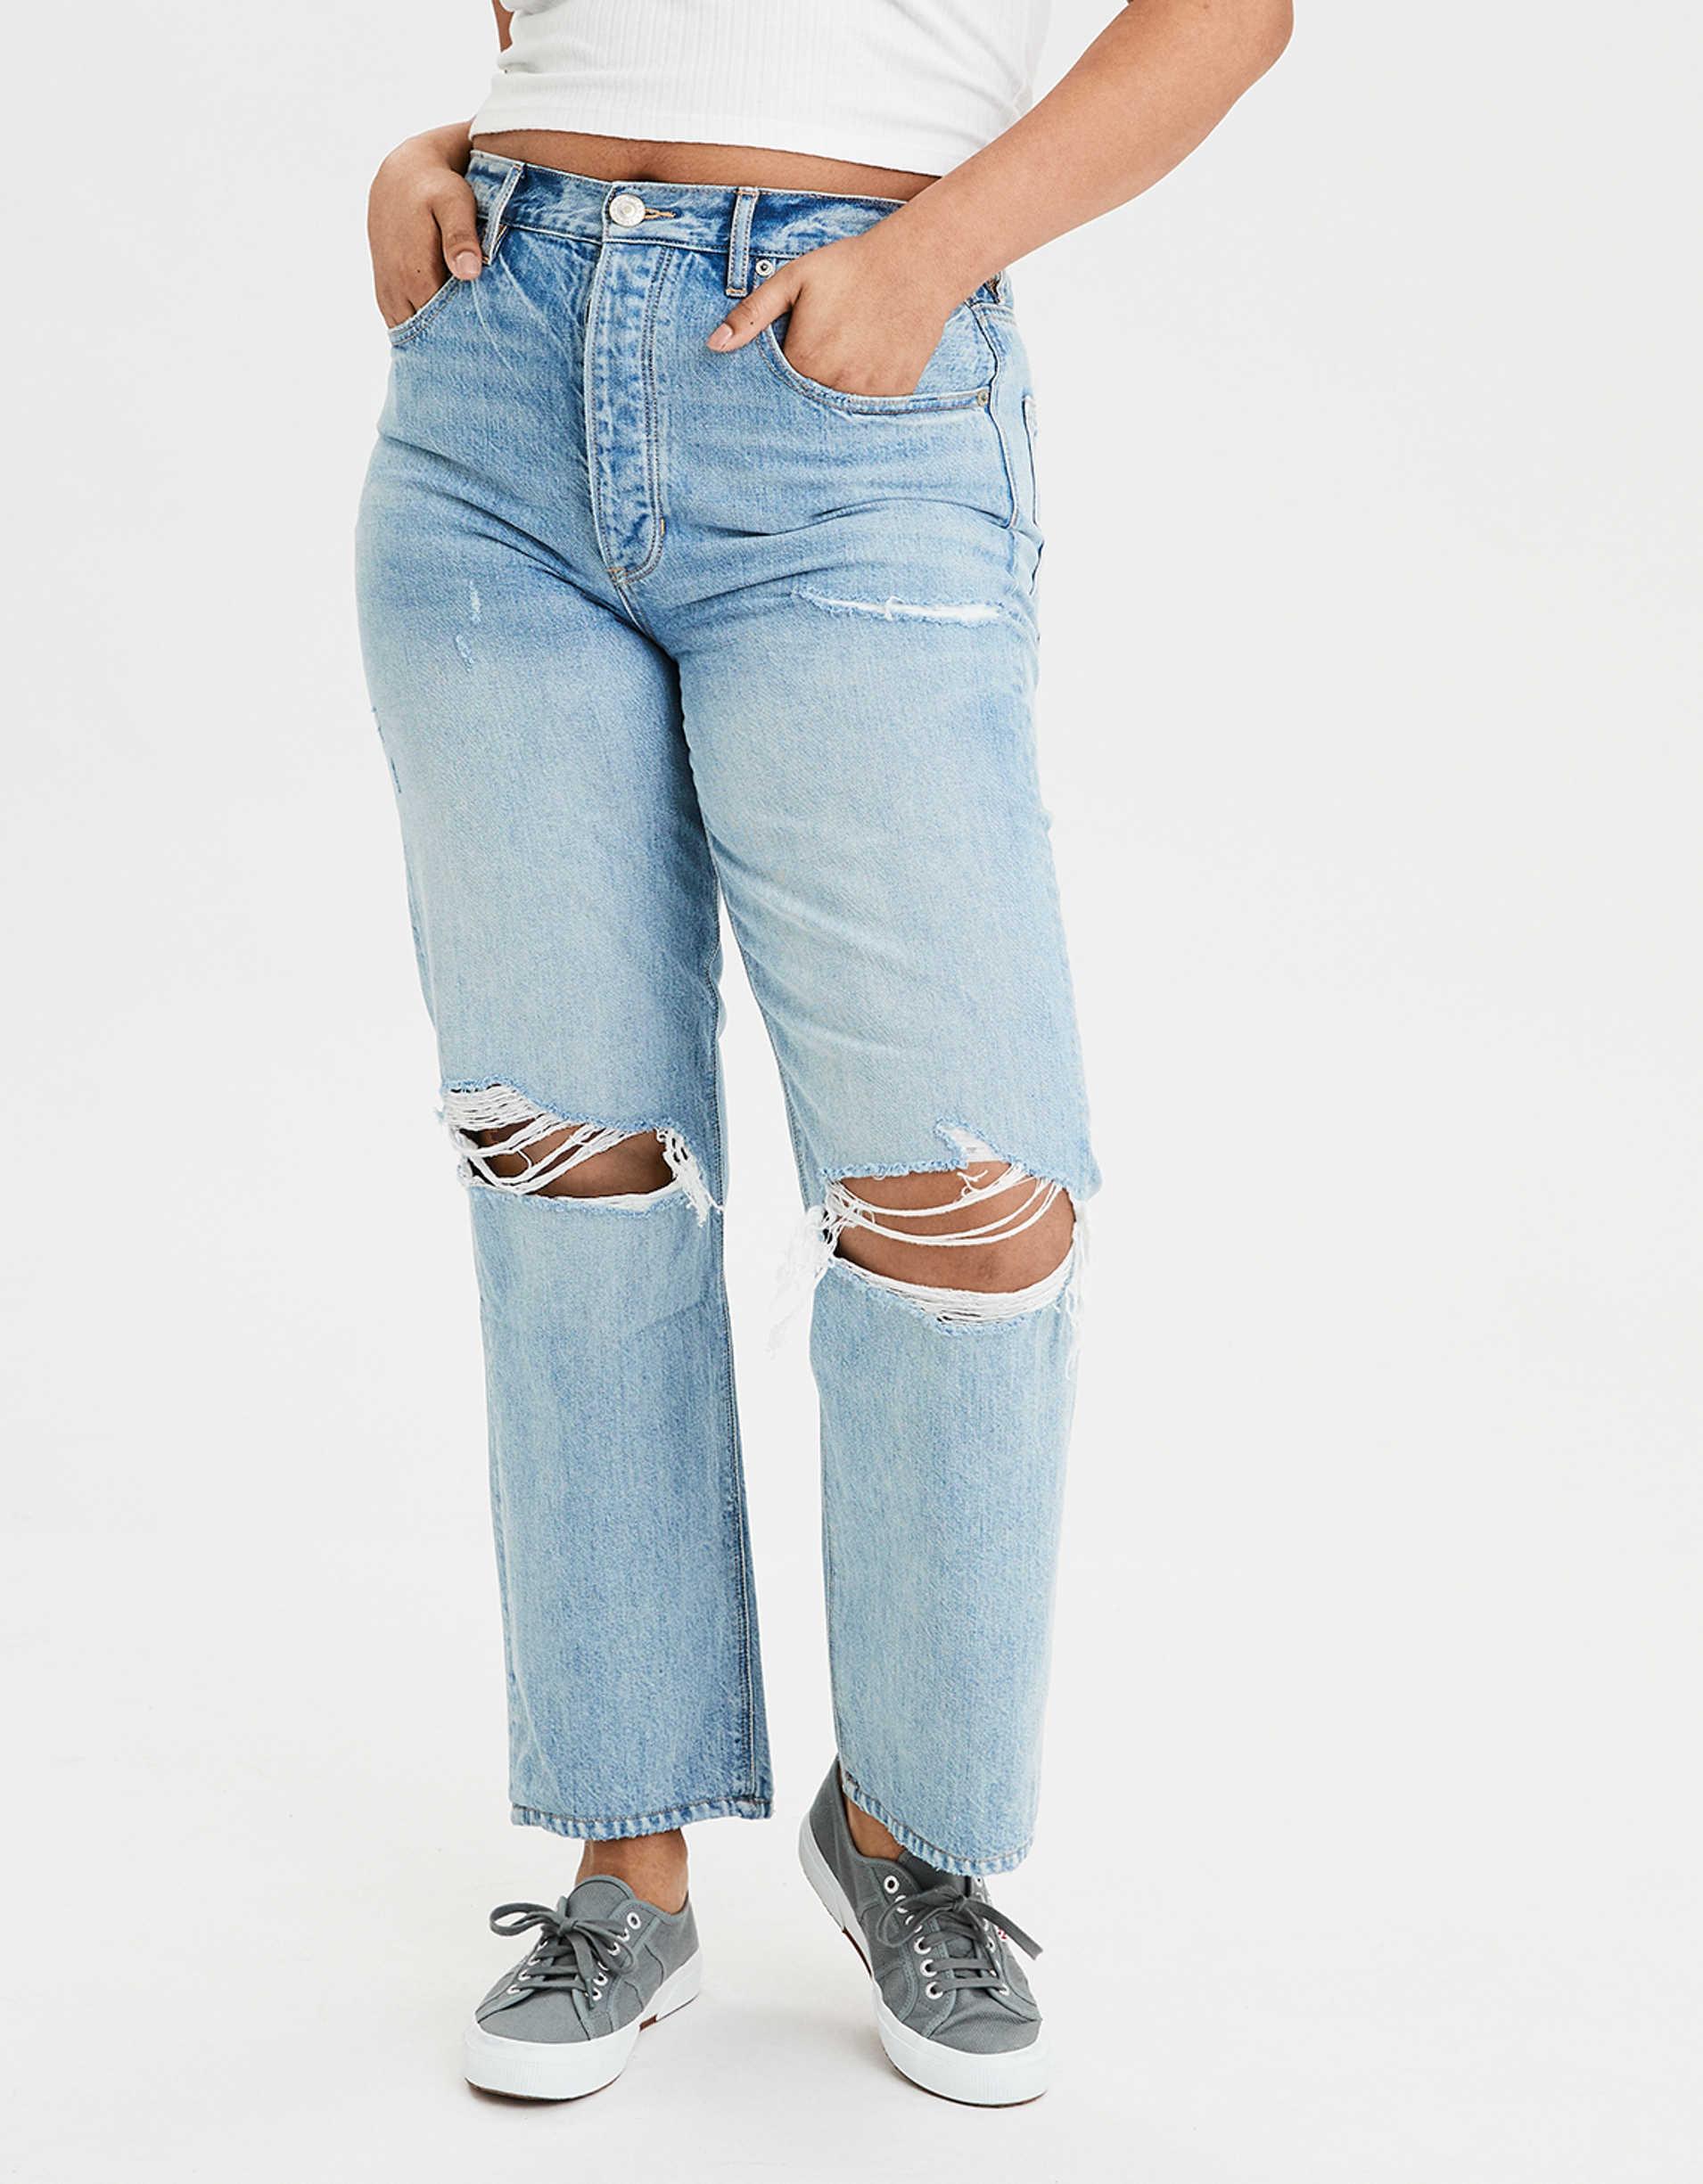 90s Boyfriend Jeans | American Eagle